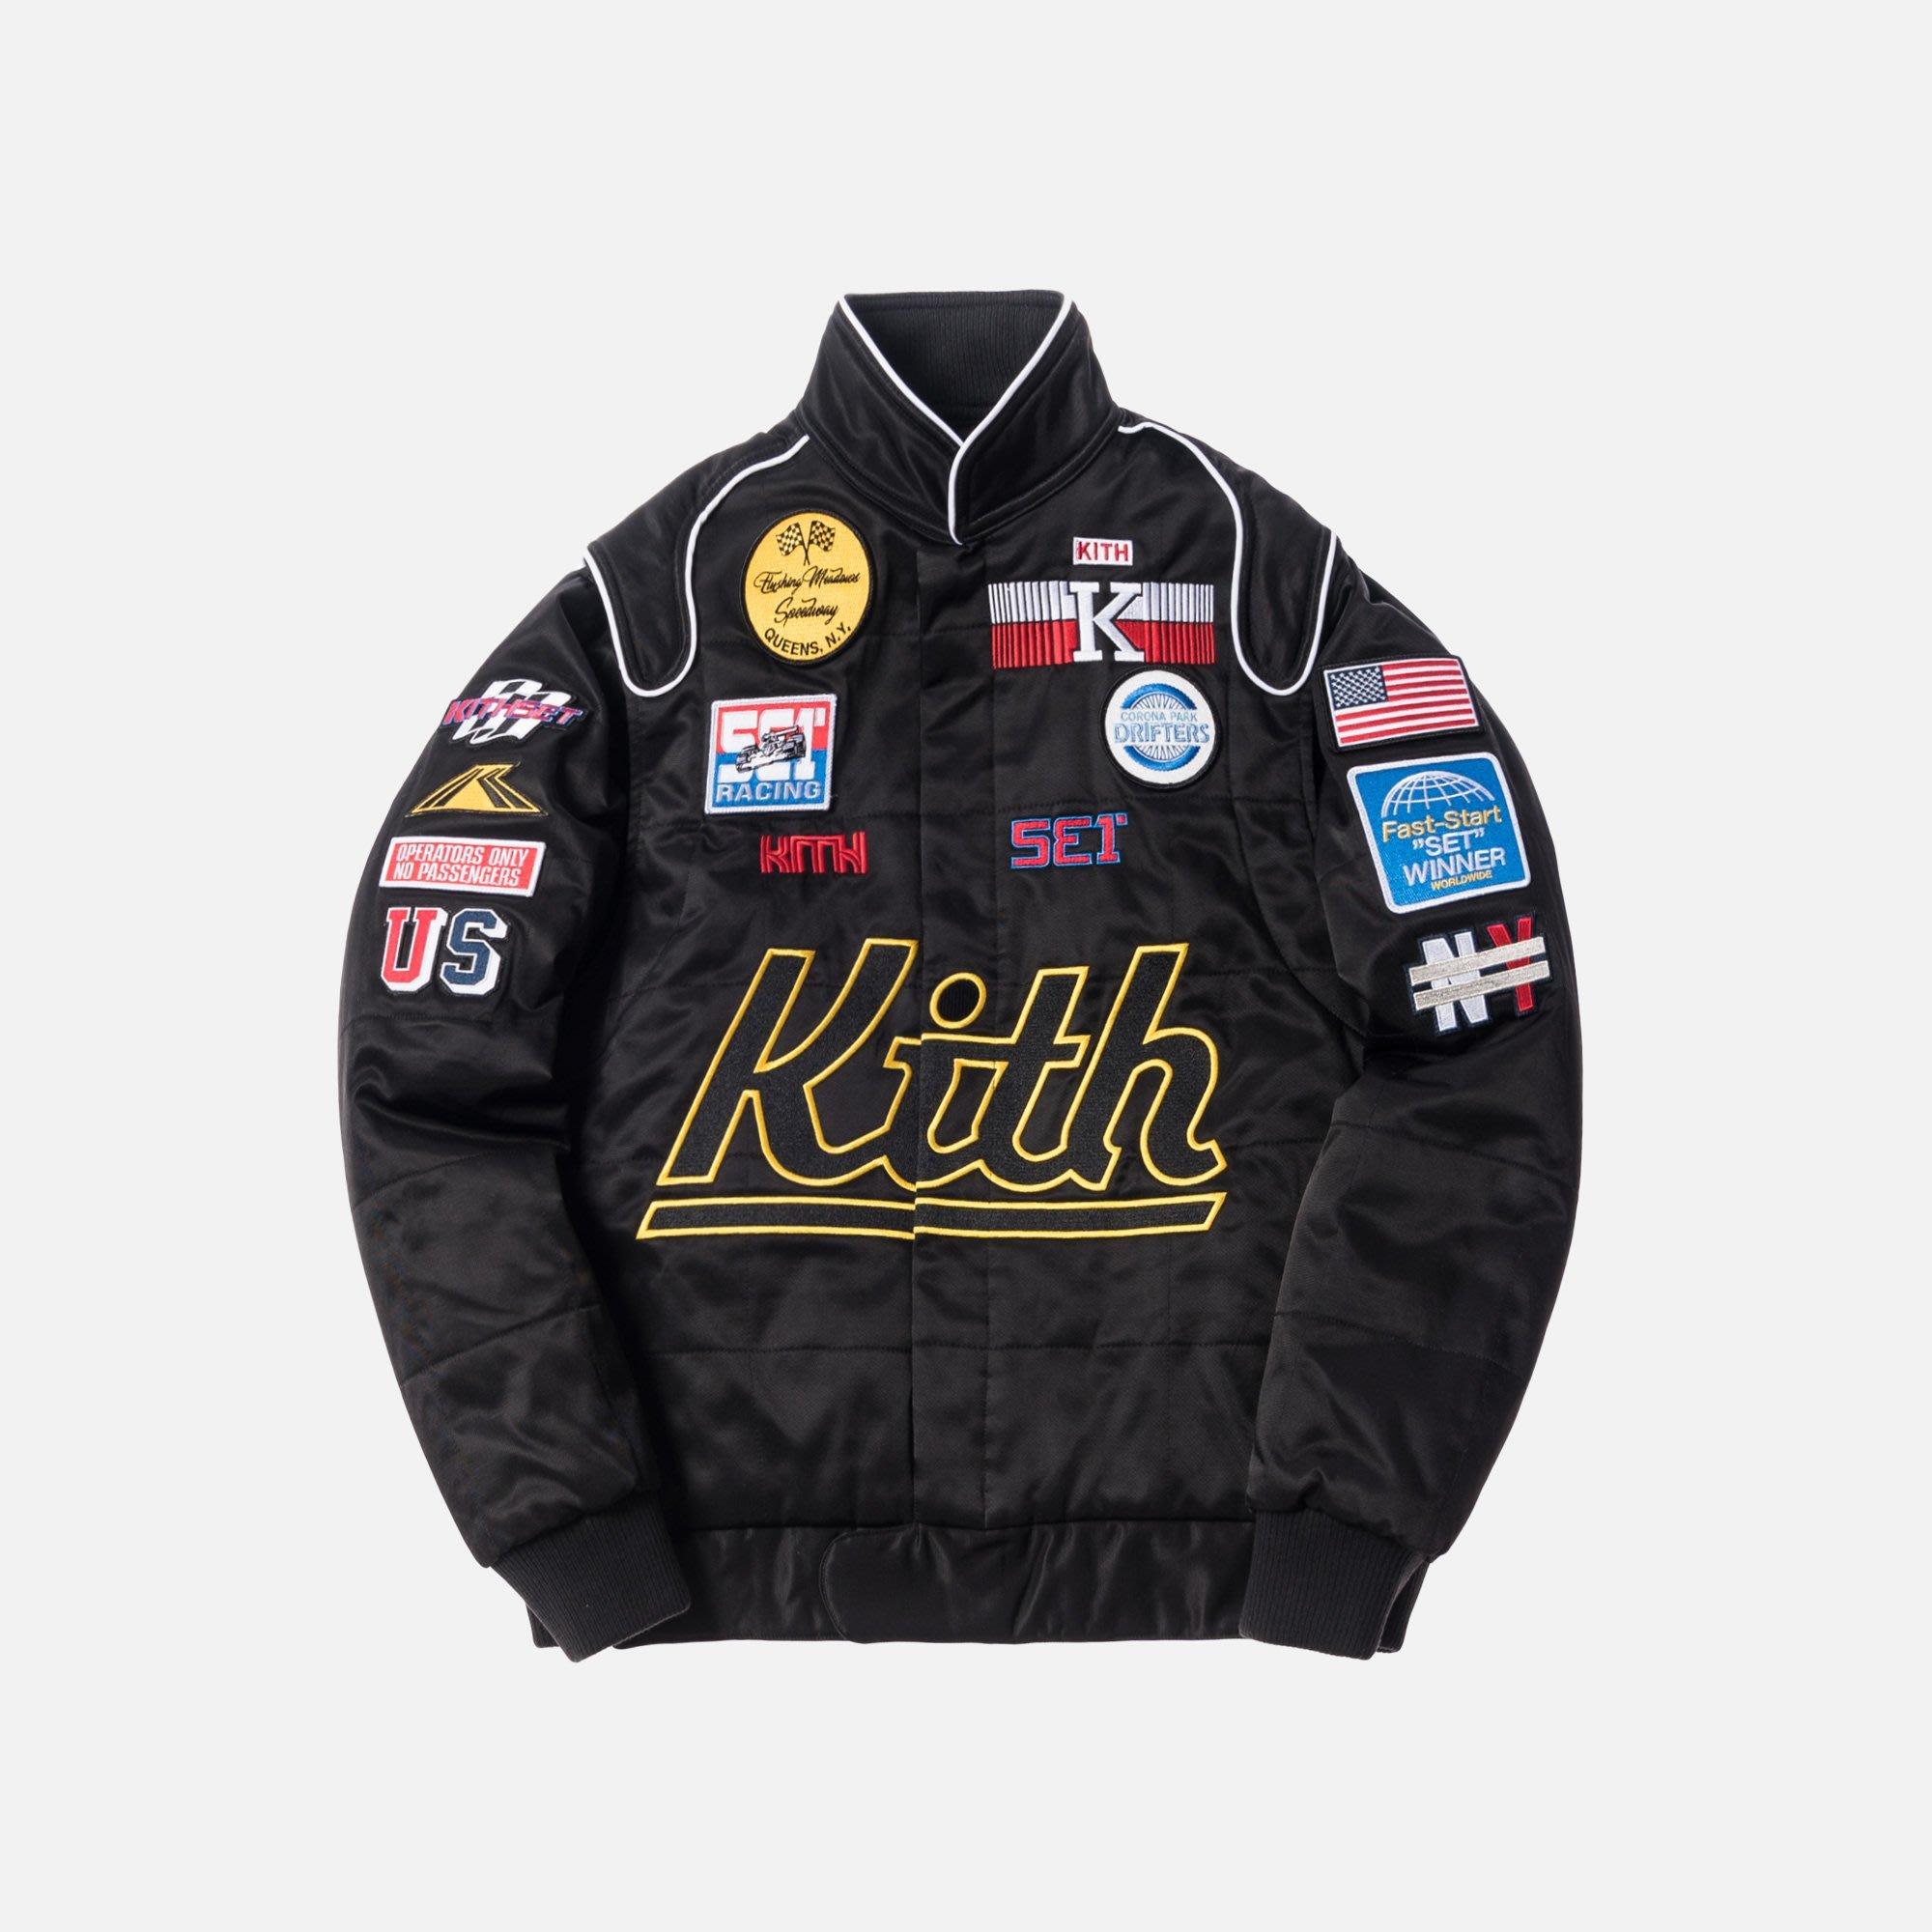 KITH RACING JACKET 黑L 全新  價錢可議